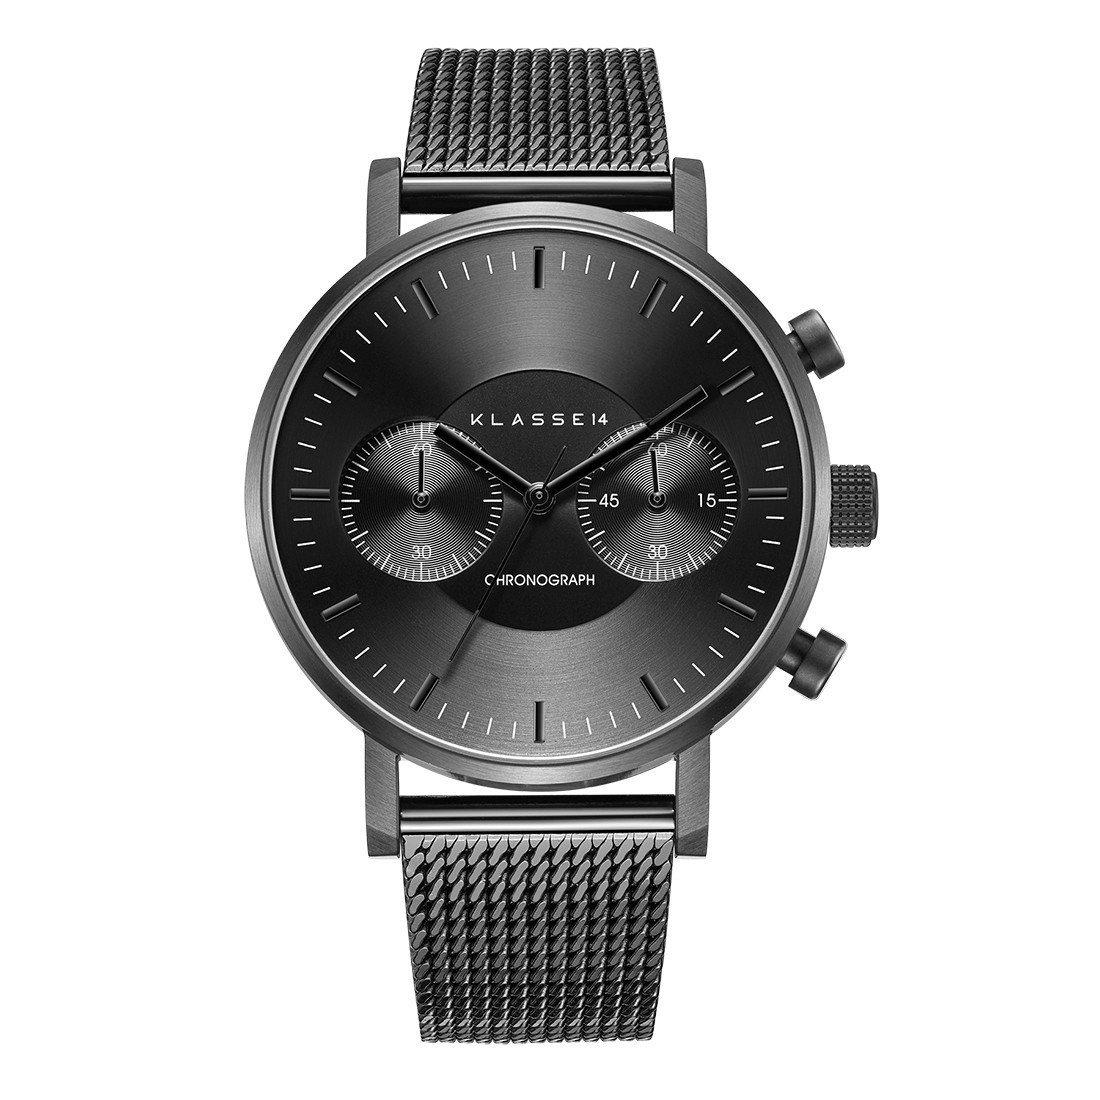 Volare Chronograph黑色米蘭帶計時腕表,11,480元。圖/KL...